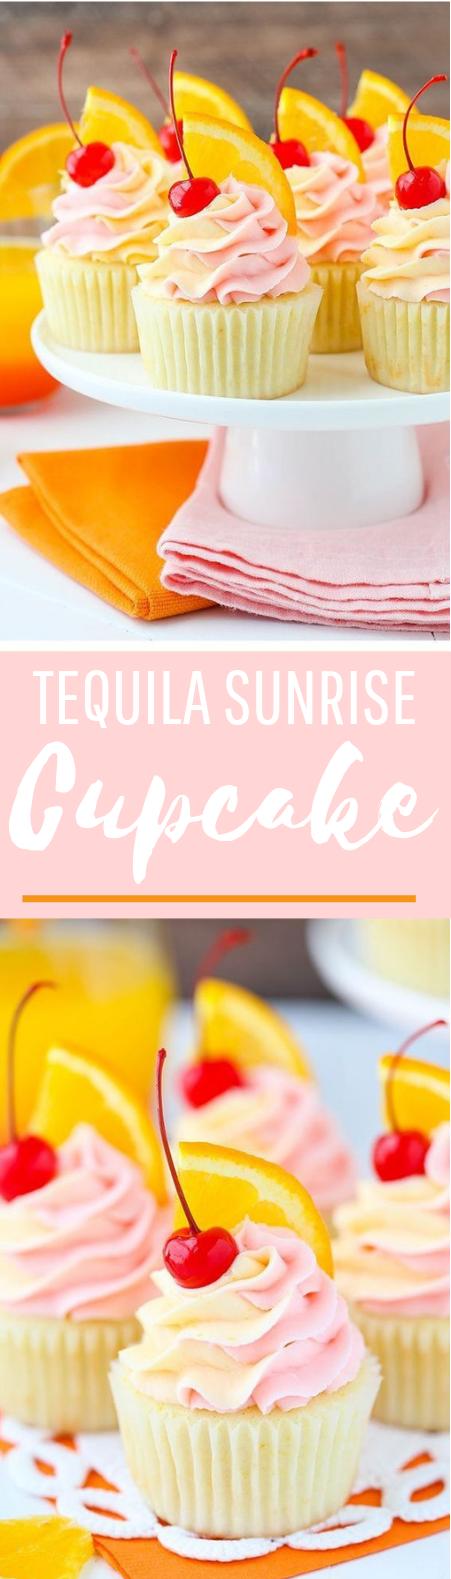 Tequila Sunrise Cupcakes #desserrt #summer